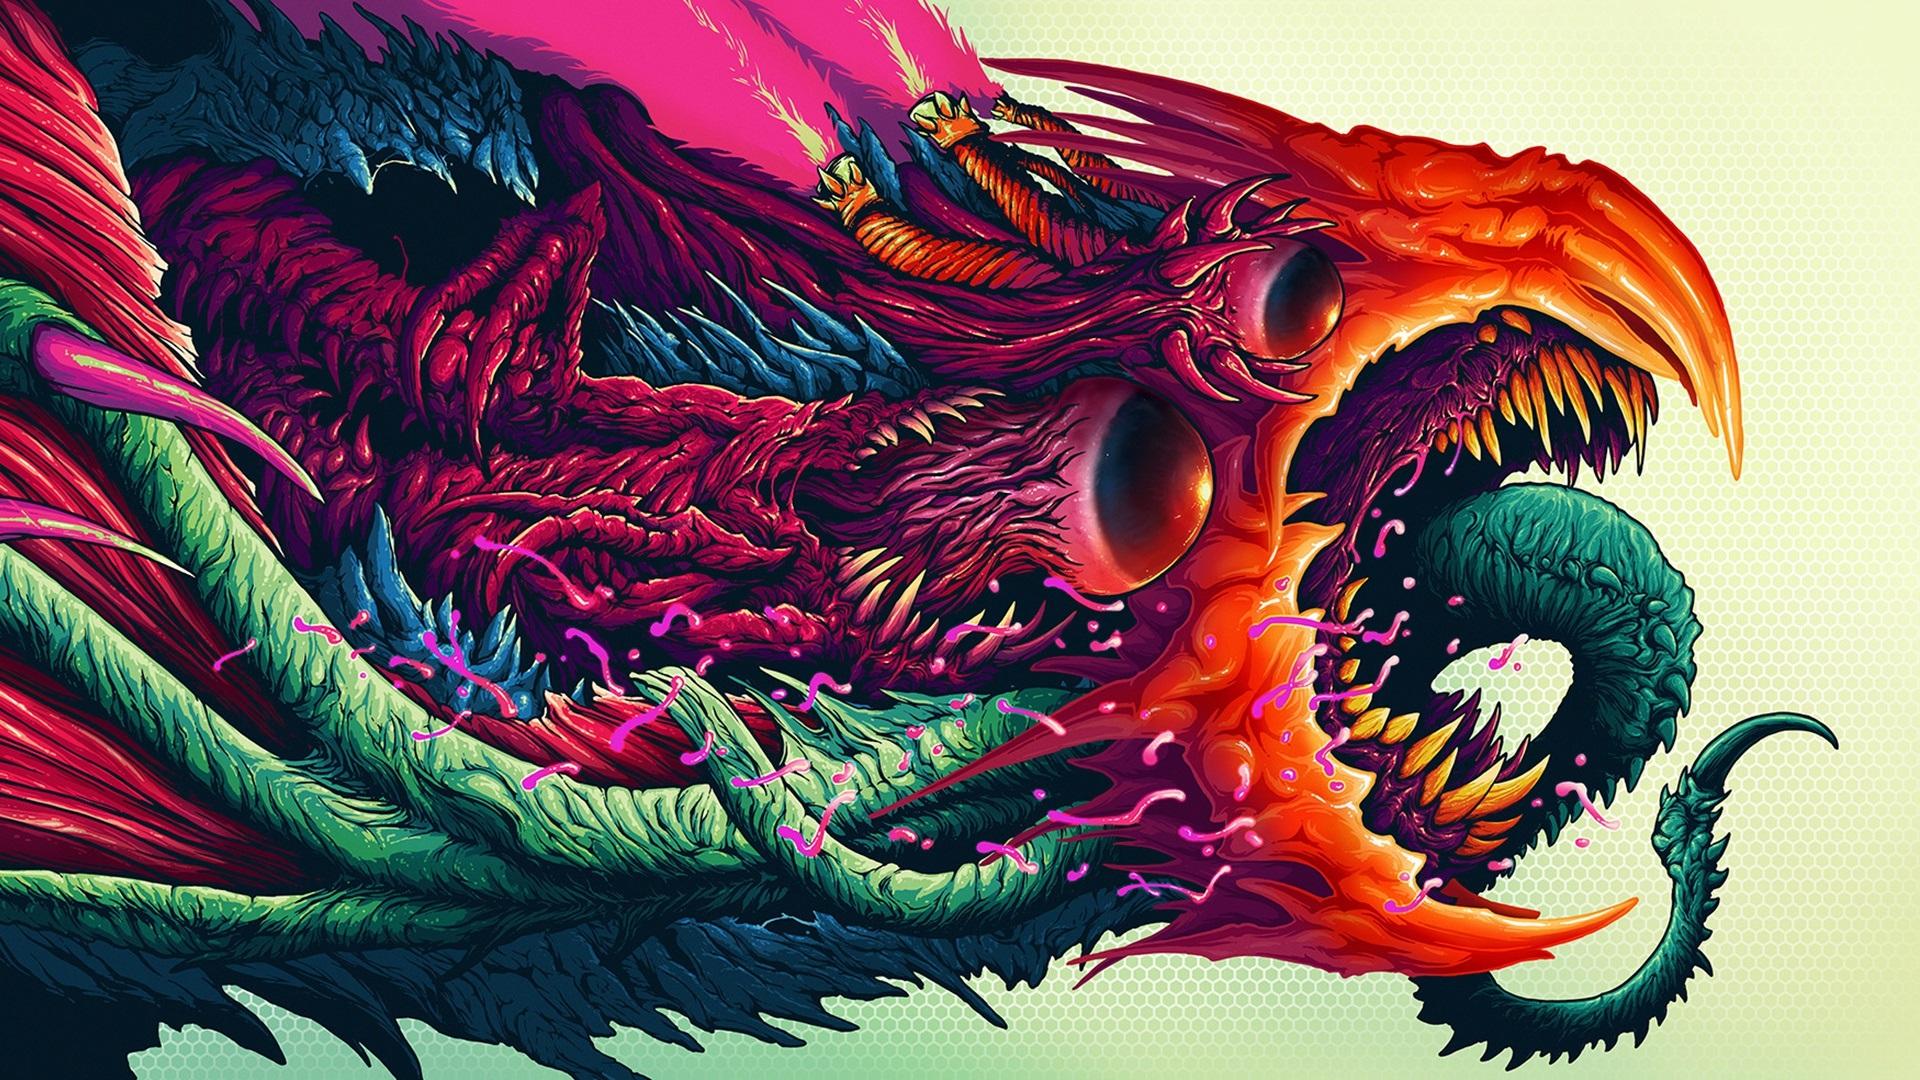 Wallpaper Monster Colorful Art Painting 1920x1080 Full Hd 2k